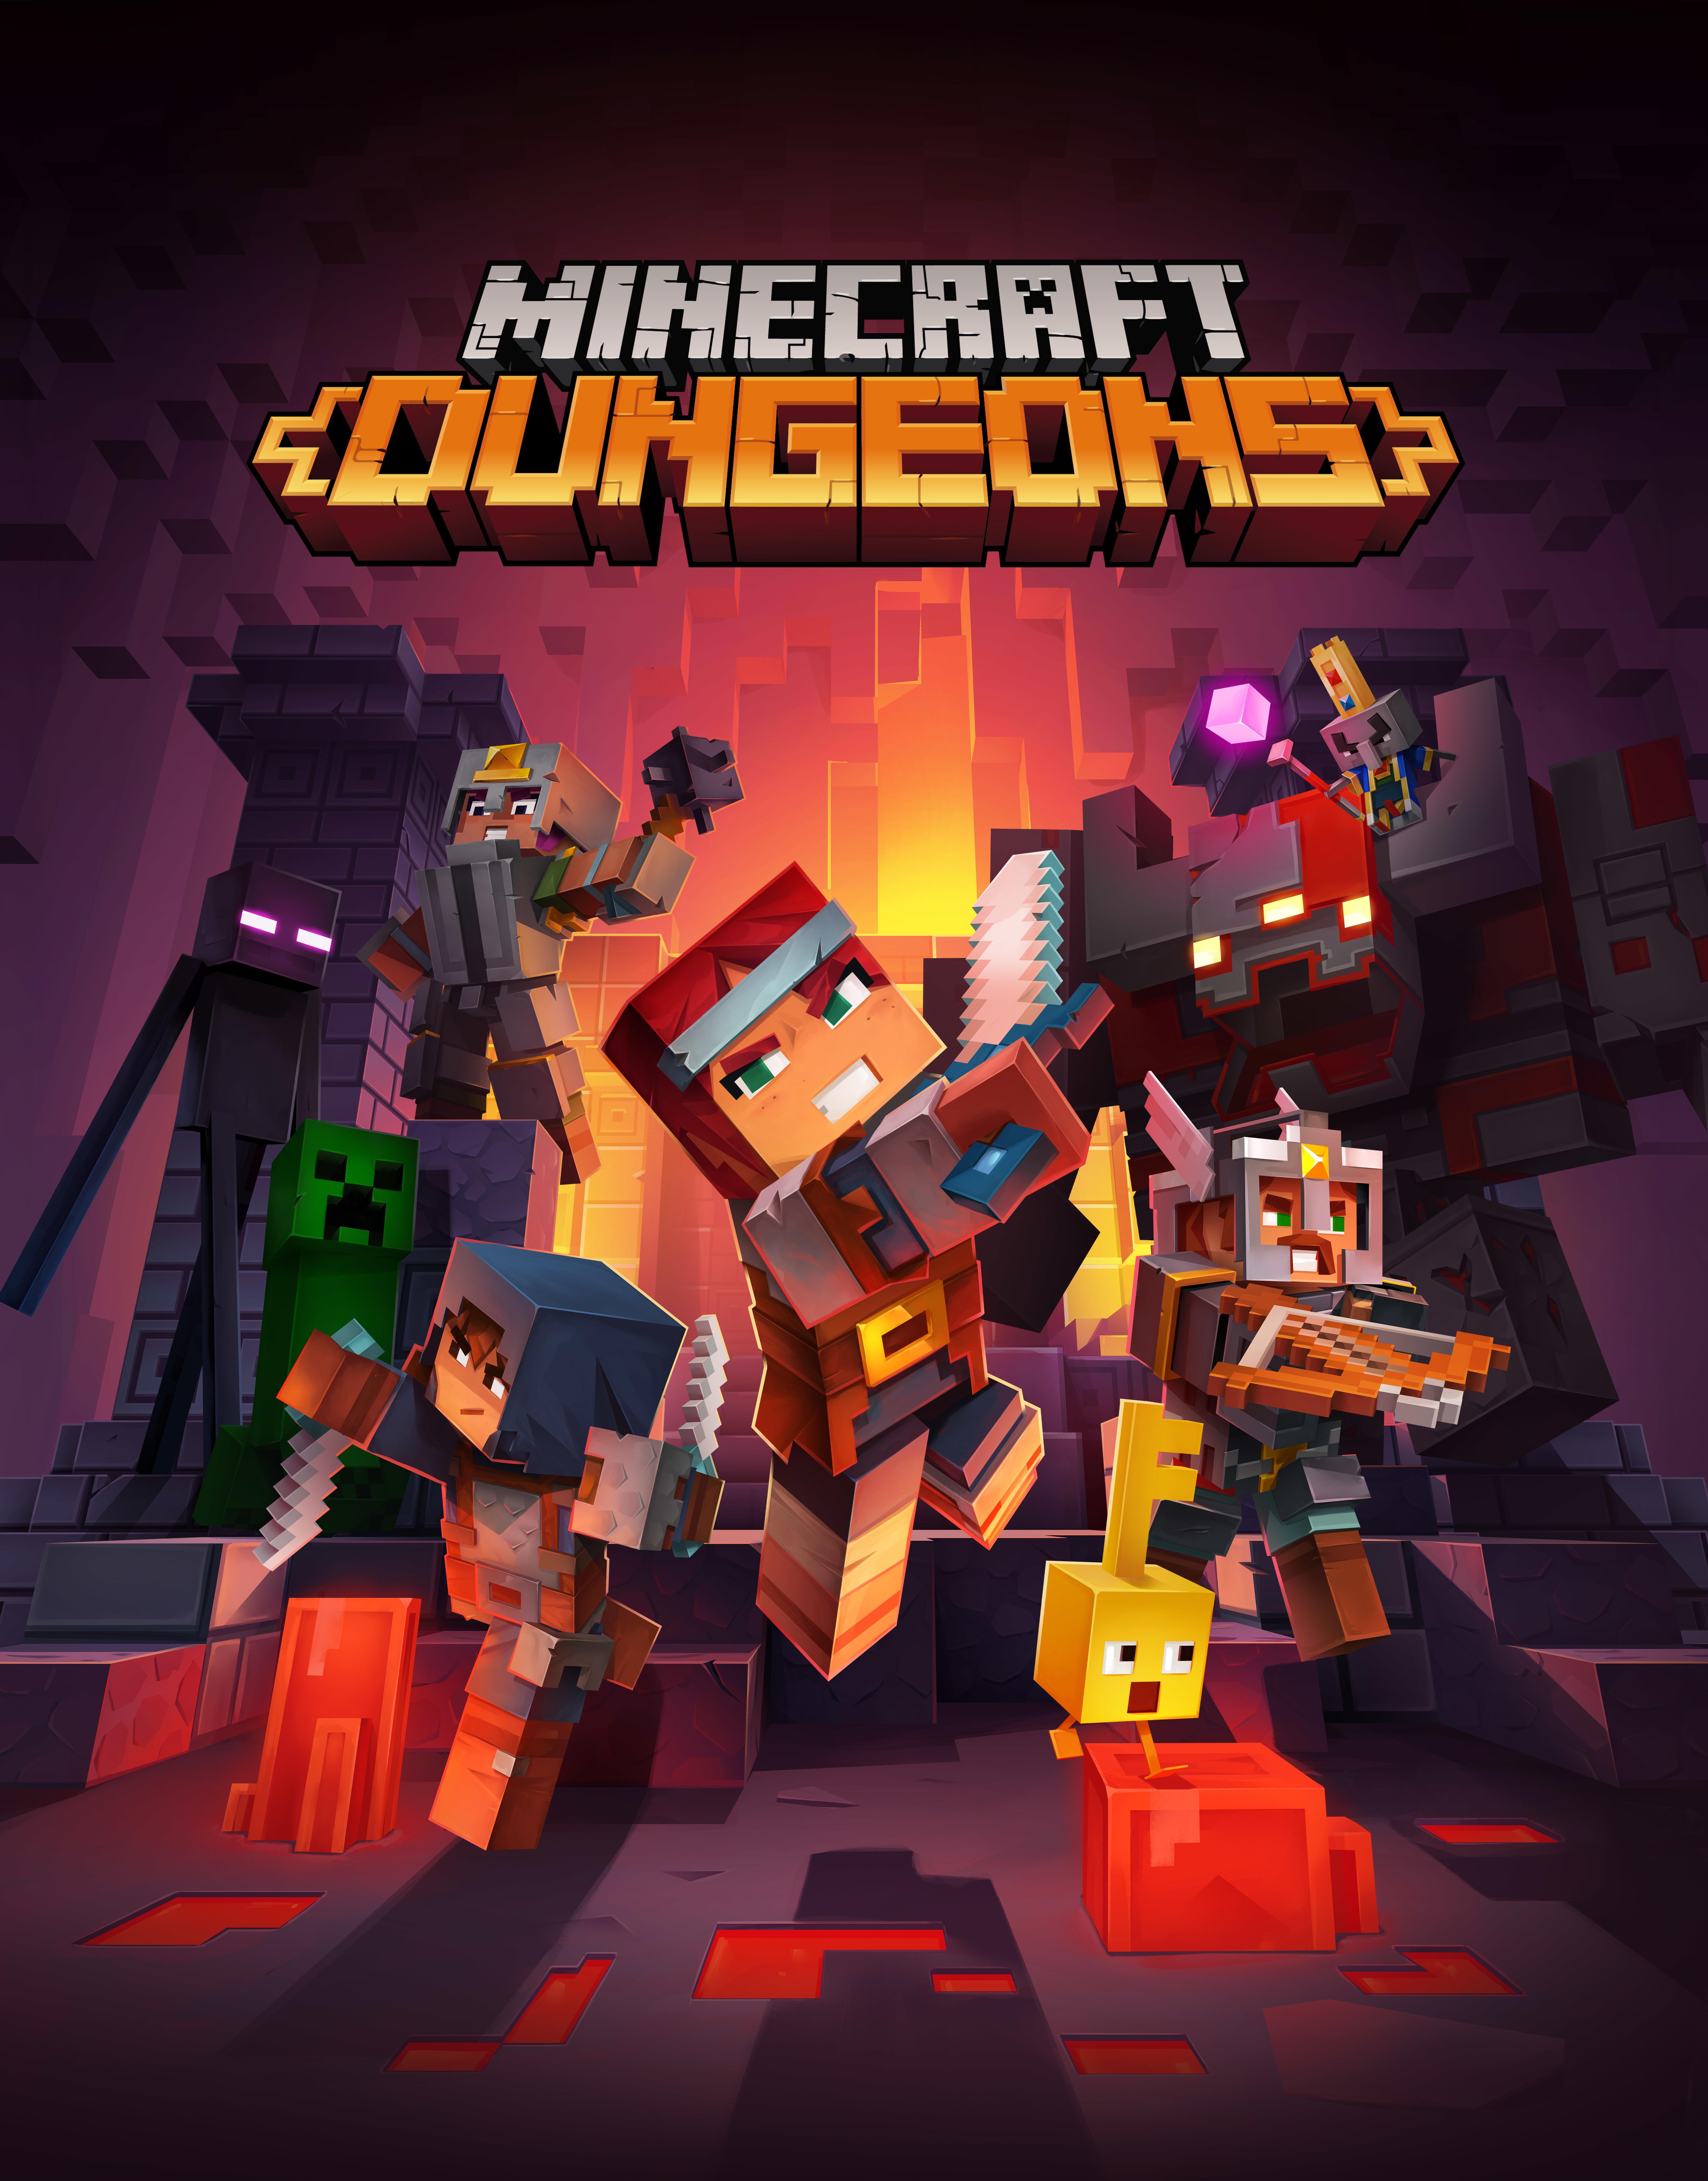 Minecraft Dungeons Wallpaper, HD Games 4K Wallpapers ...